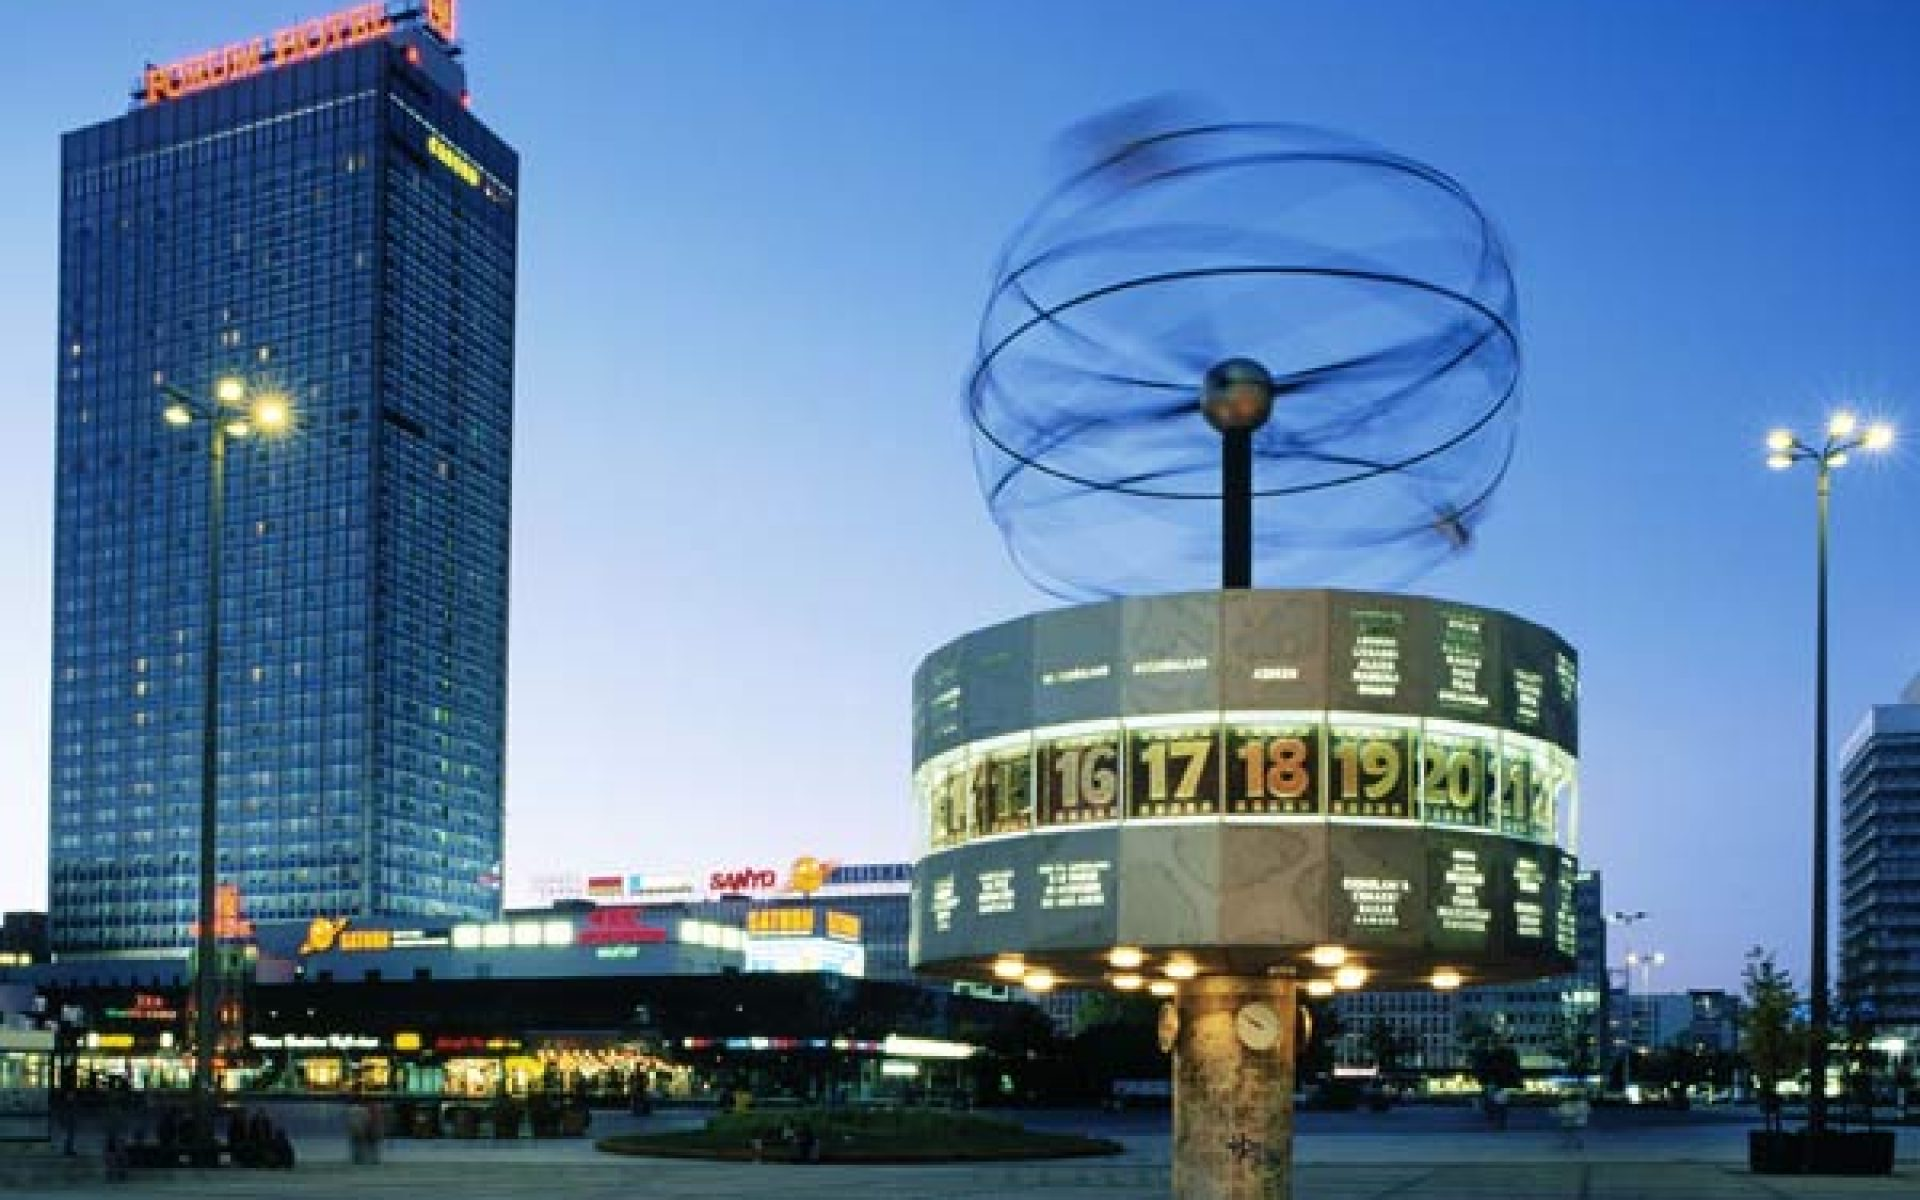 Alexanderplatz World Time Clock